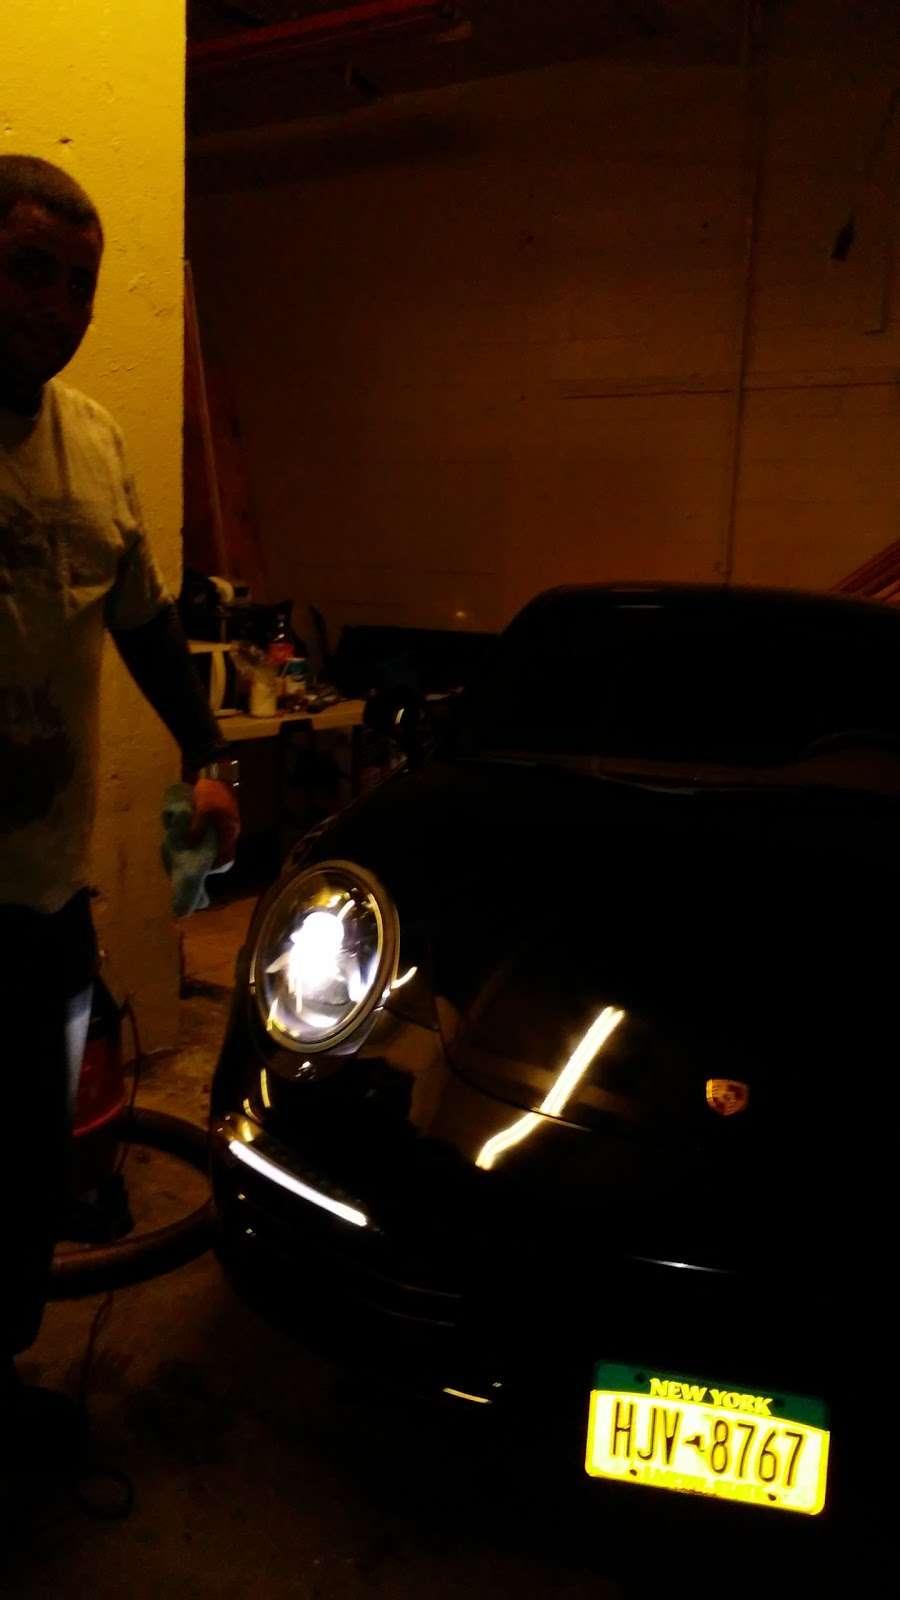 King Automobile Body - car repair  | Photo 2 of 2 | Address: 905 Sacket Ave, The Bronx, NY 10462, USA | Phone: (718) 684-2323